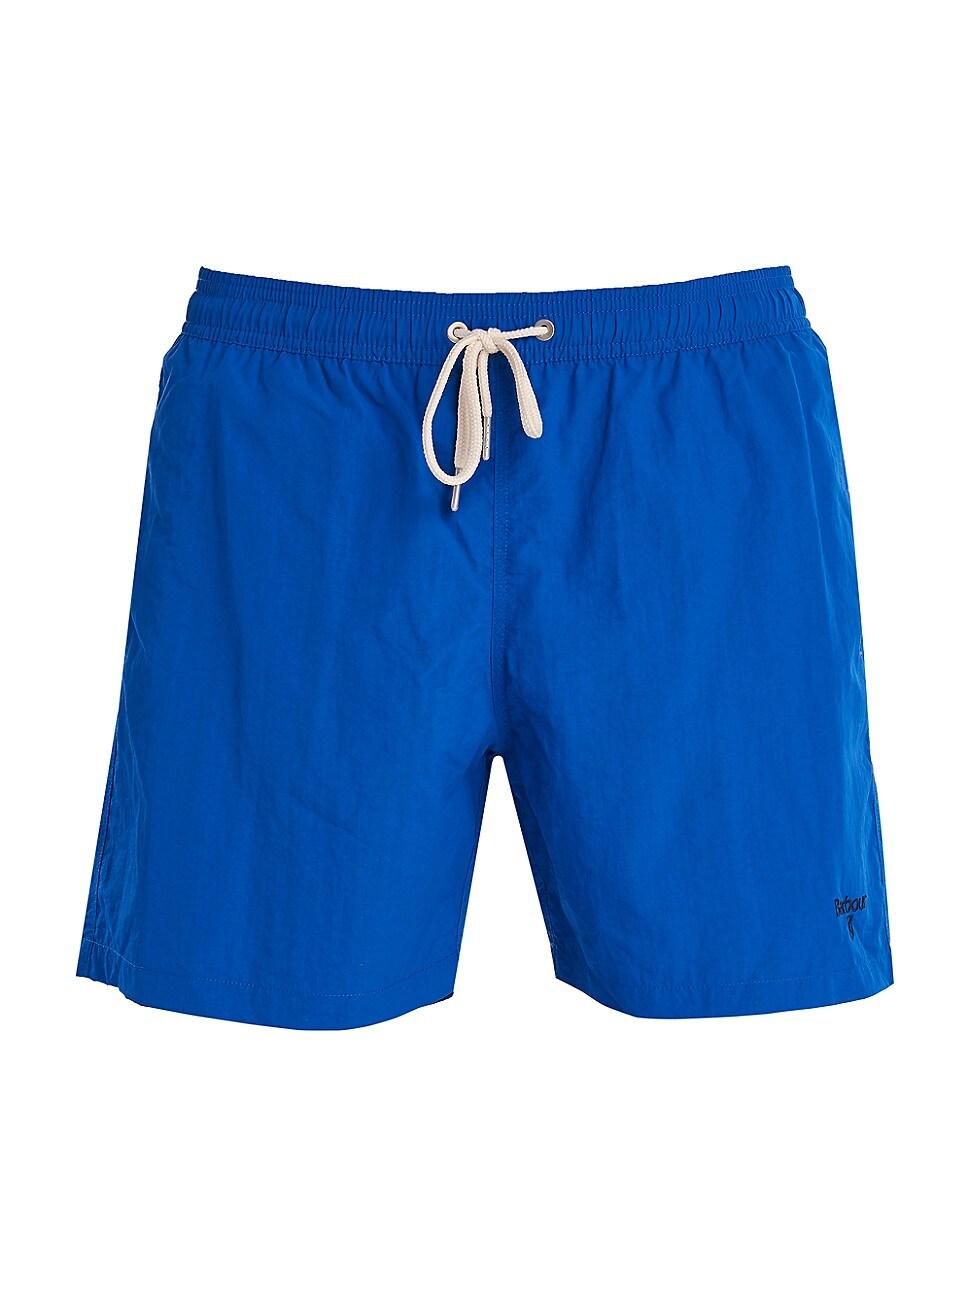 Barbour Essential Logo 7 Inch Swim Short In Bright Blue